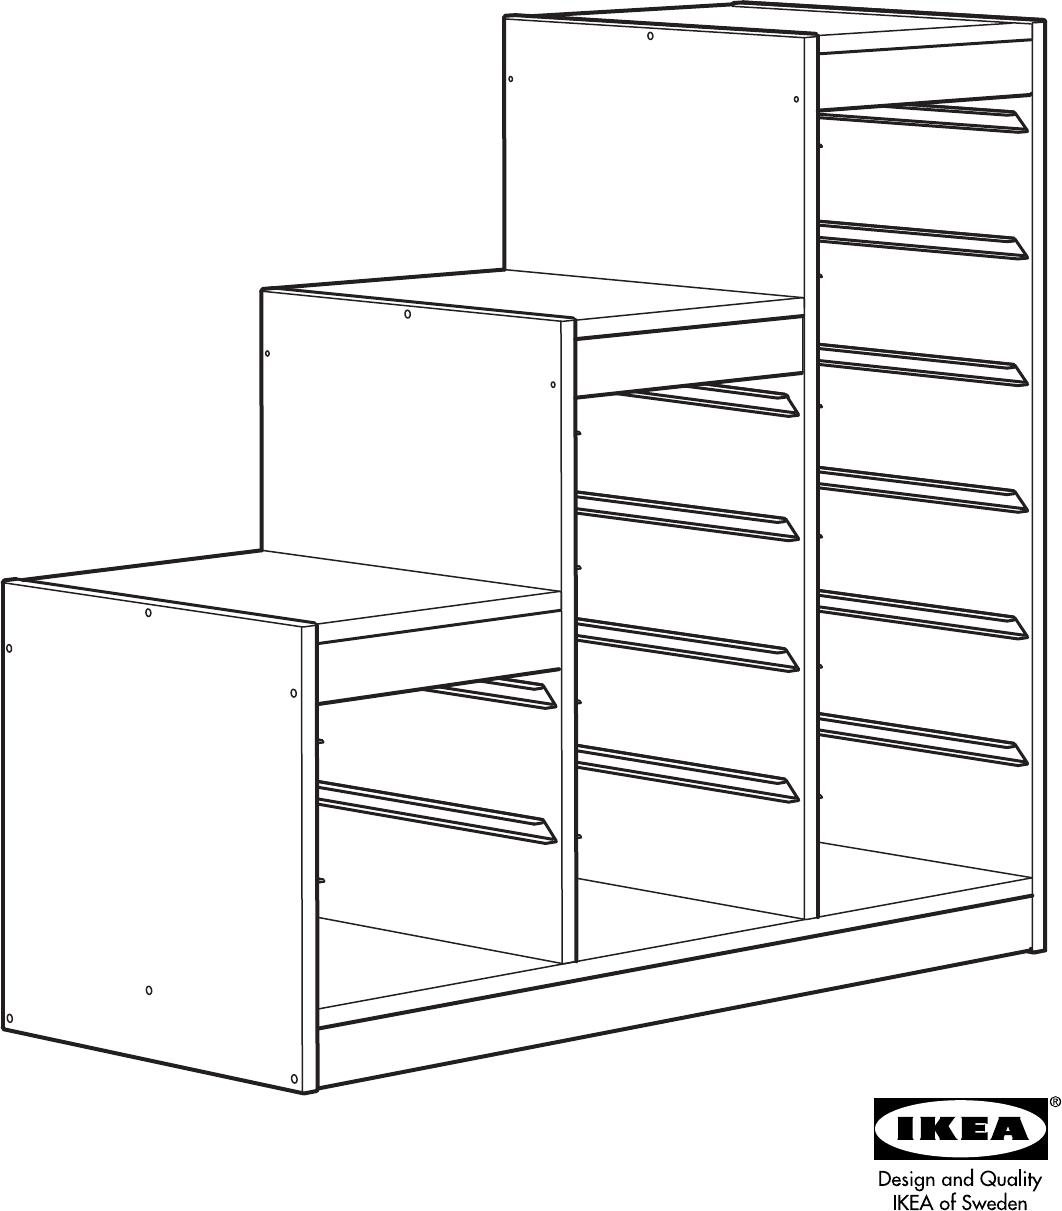 Handleiding Ikea Trofast Basiselement Pagina 1 Van 12